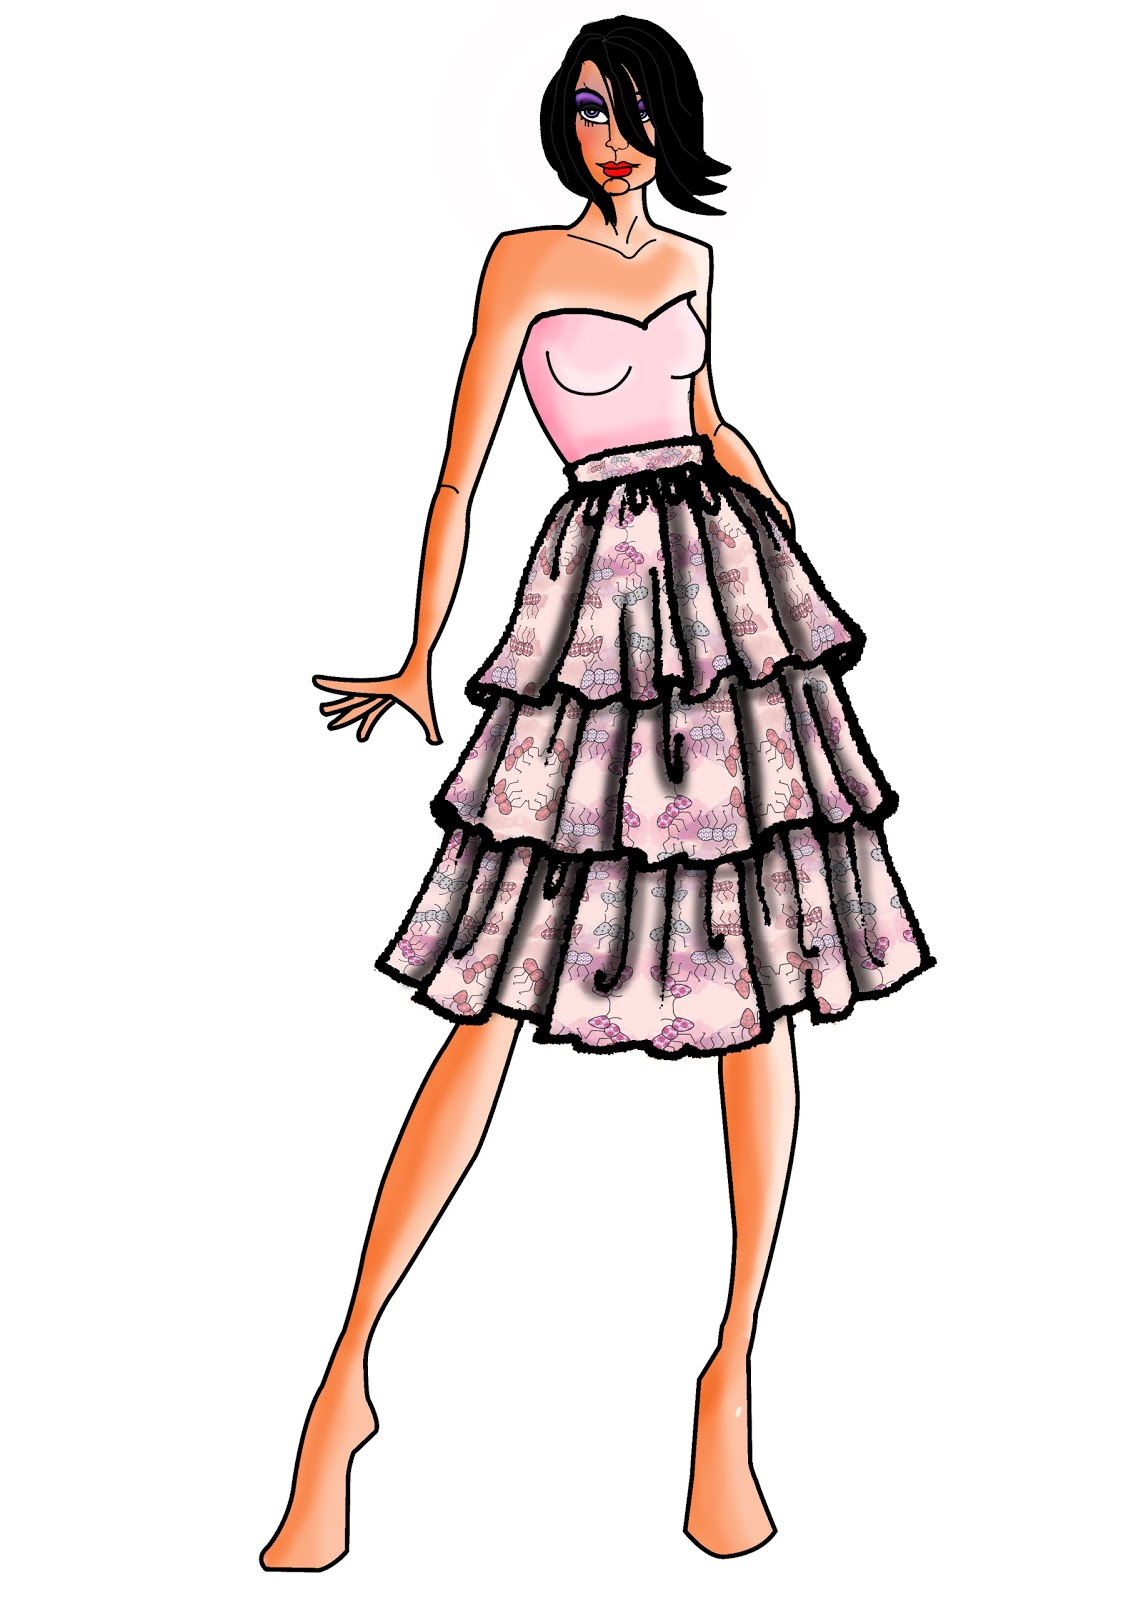 Fashion Figures: Mimimi: Rendering Fashion Figures